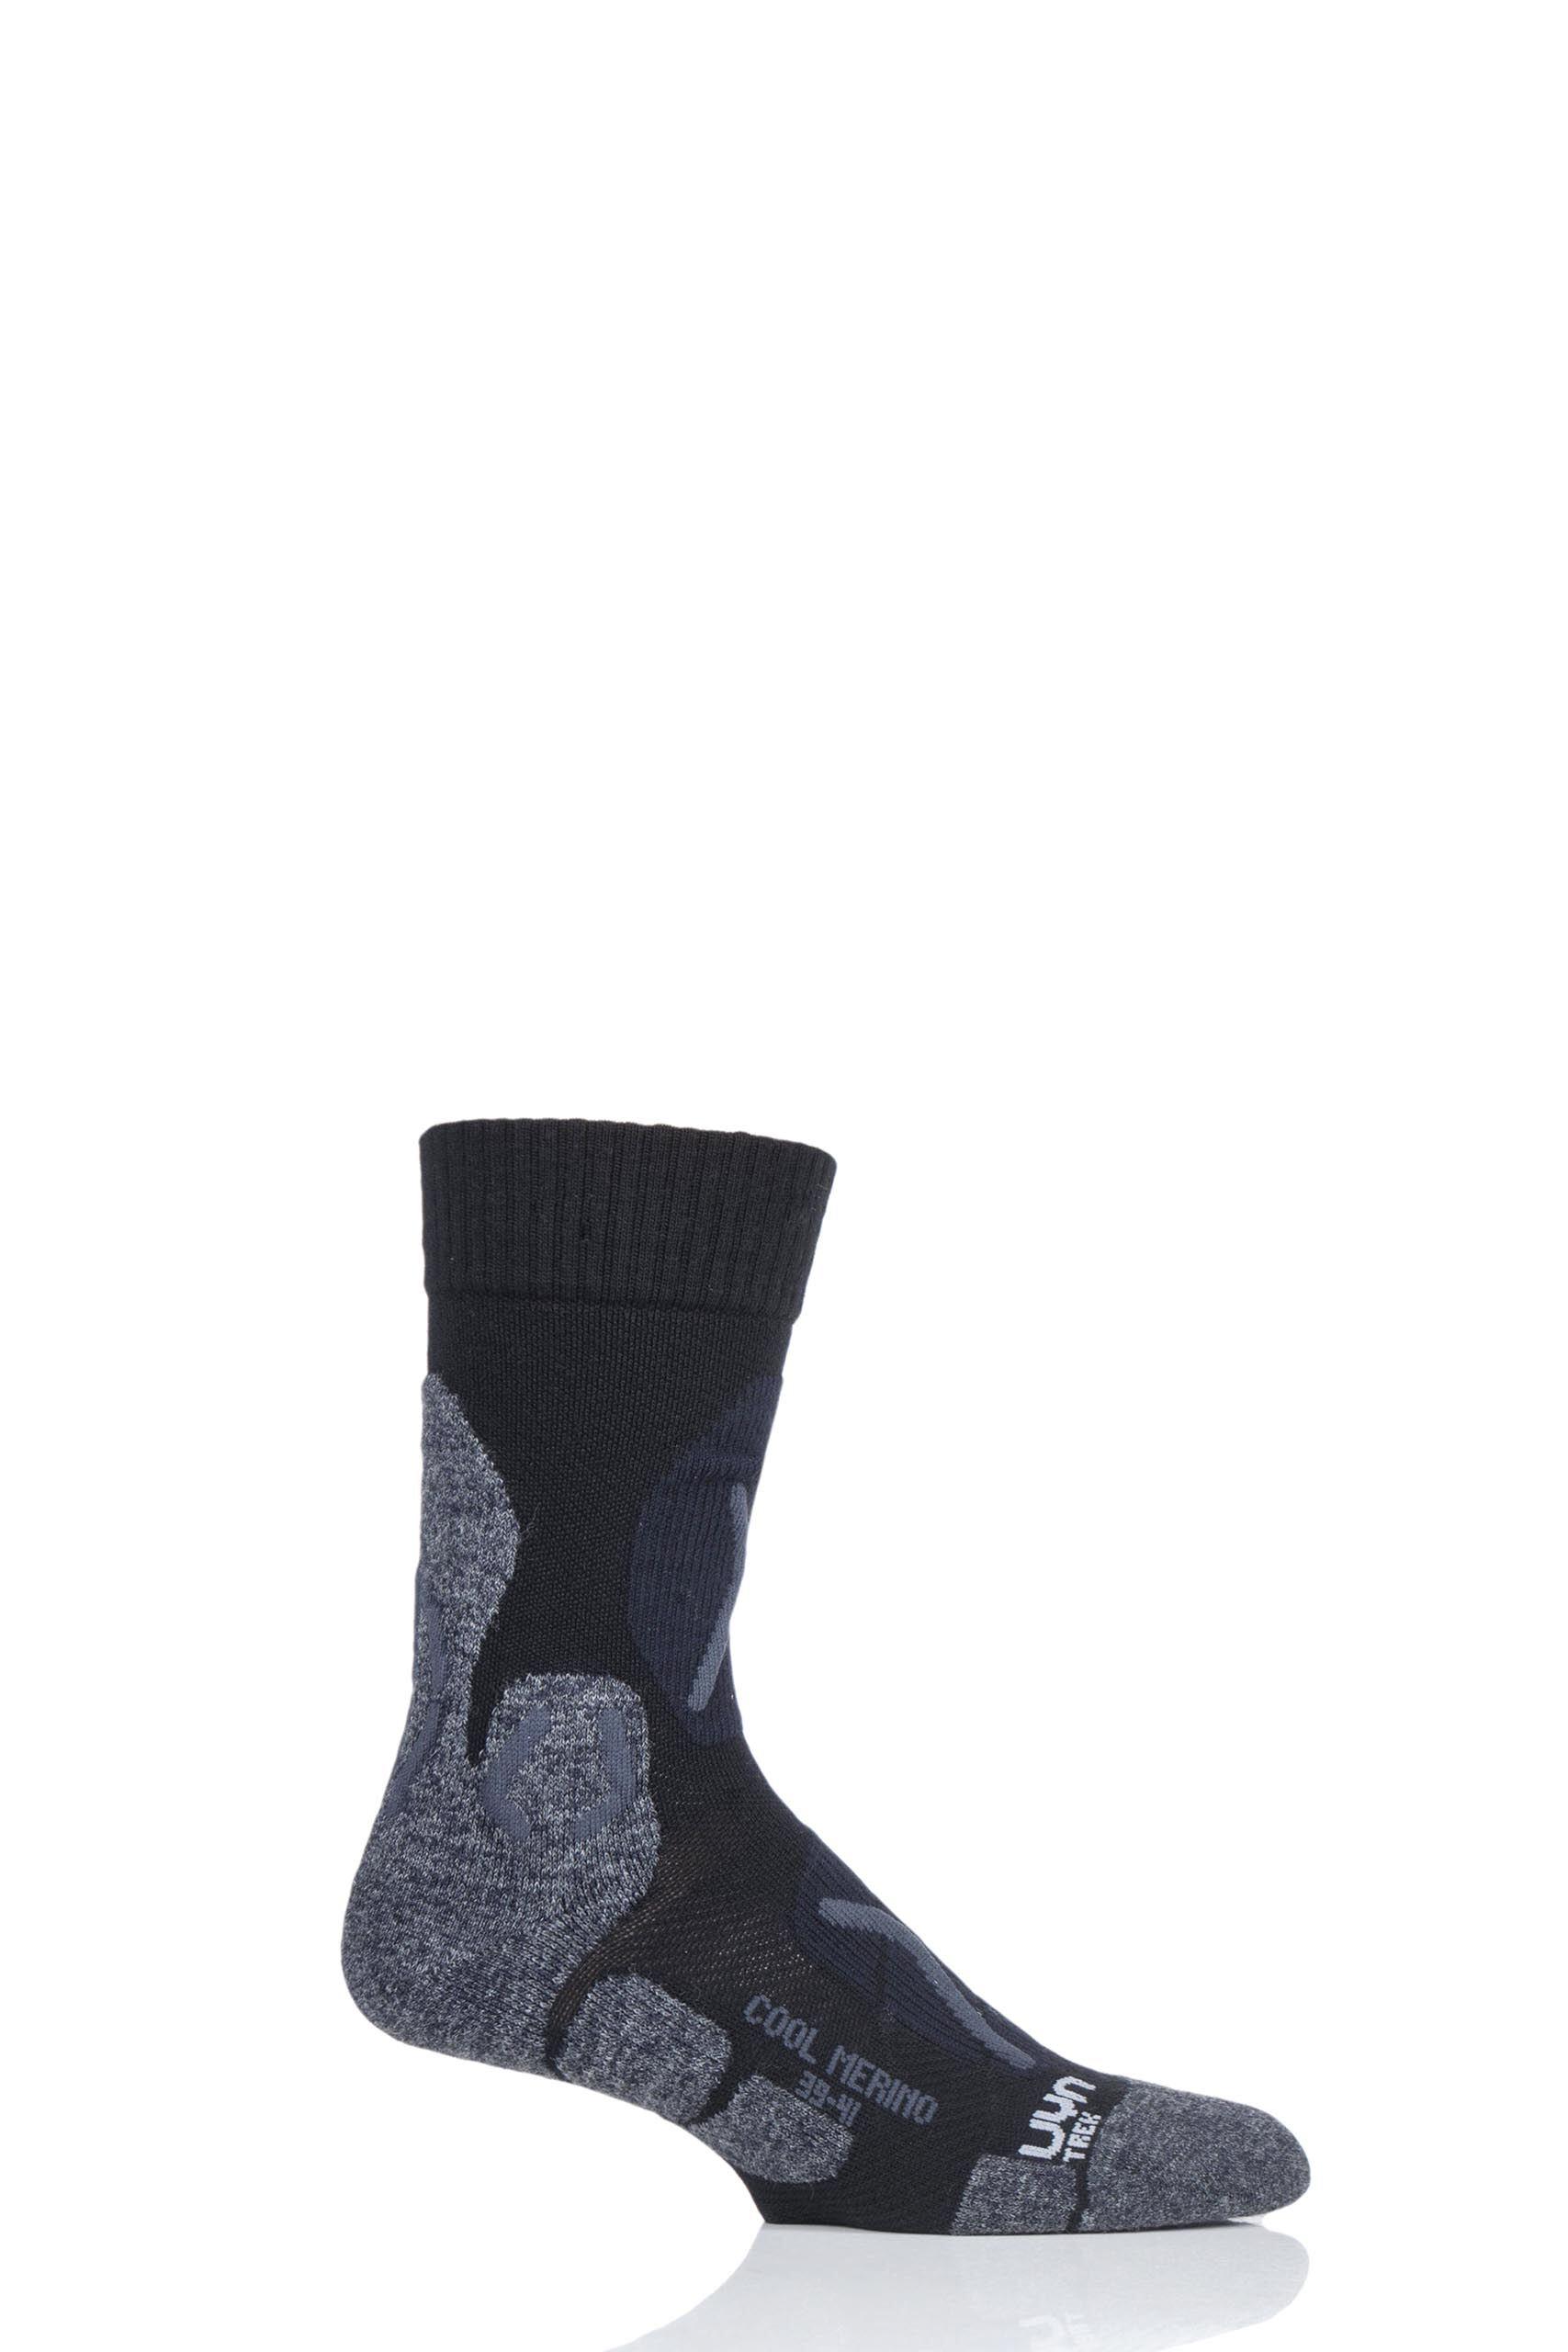 Image of 1 Pair Black Cool Merino Trekking Socks Men's 6-7.5 Mens - UYN